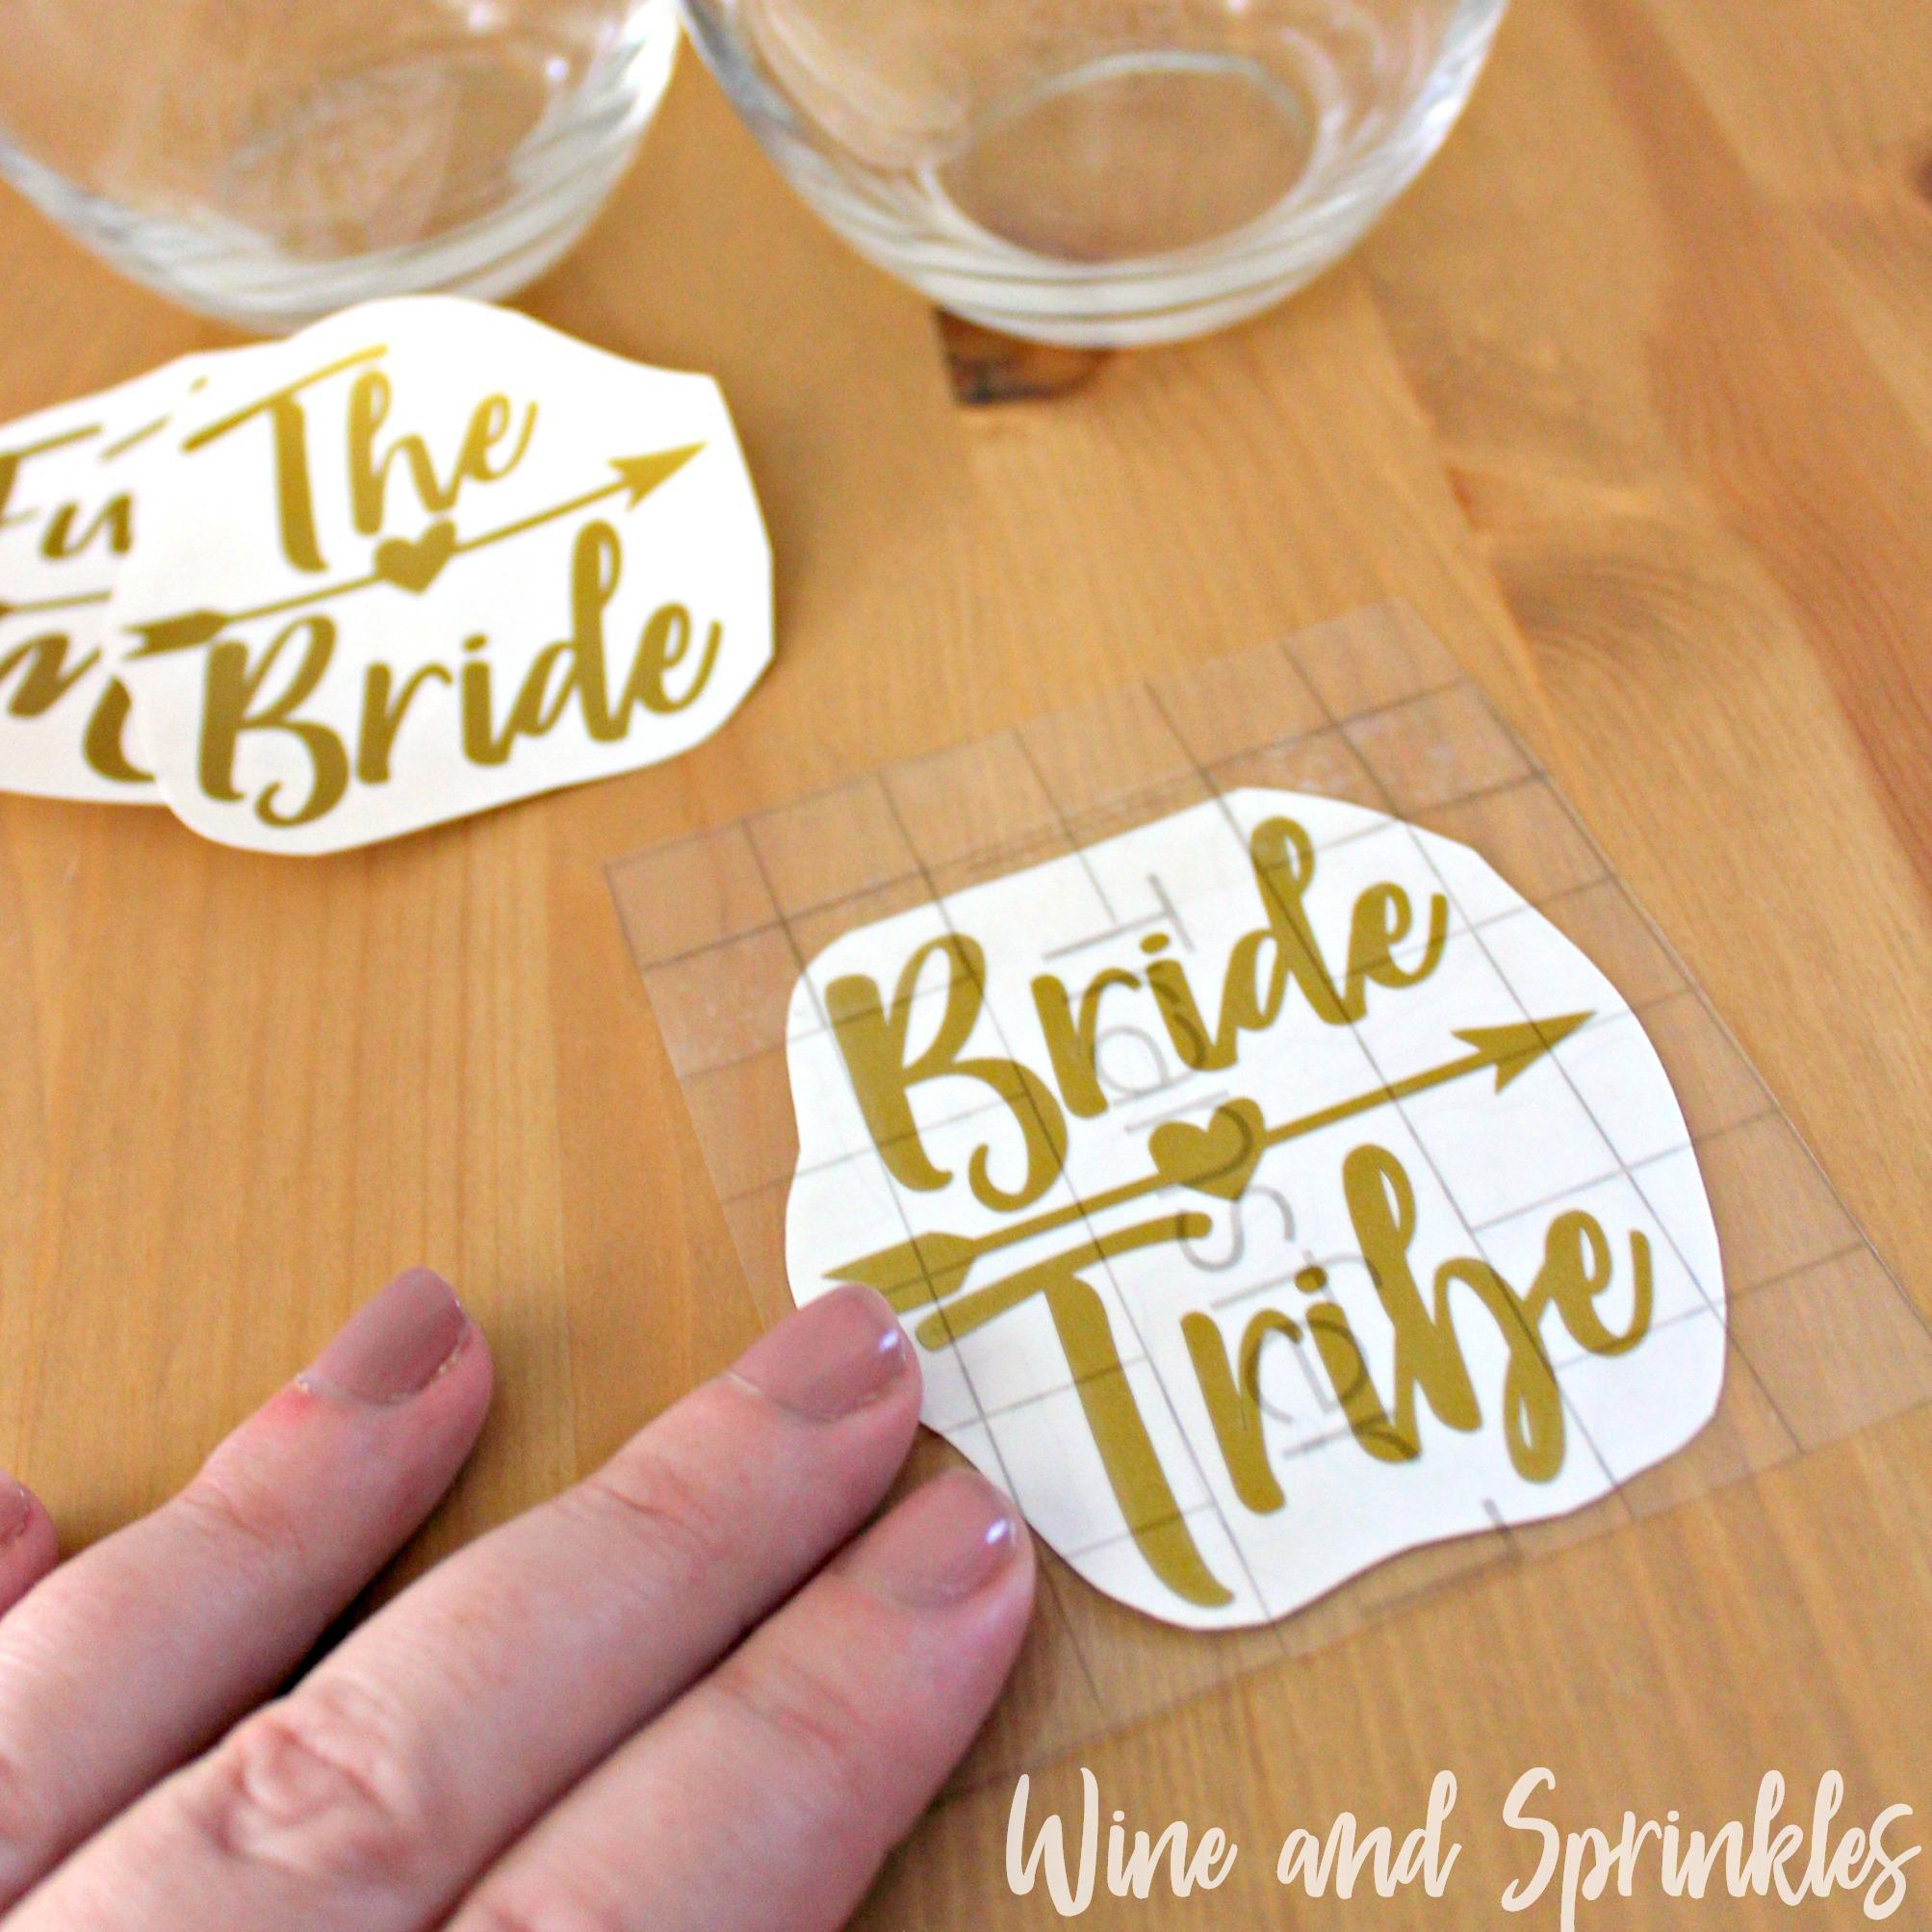 DIY Bride Tribe Bridesmaid Wine Glasses #bridetribe #wineglass #bridesmaid